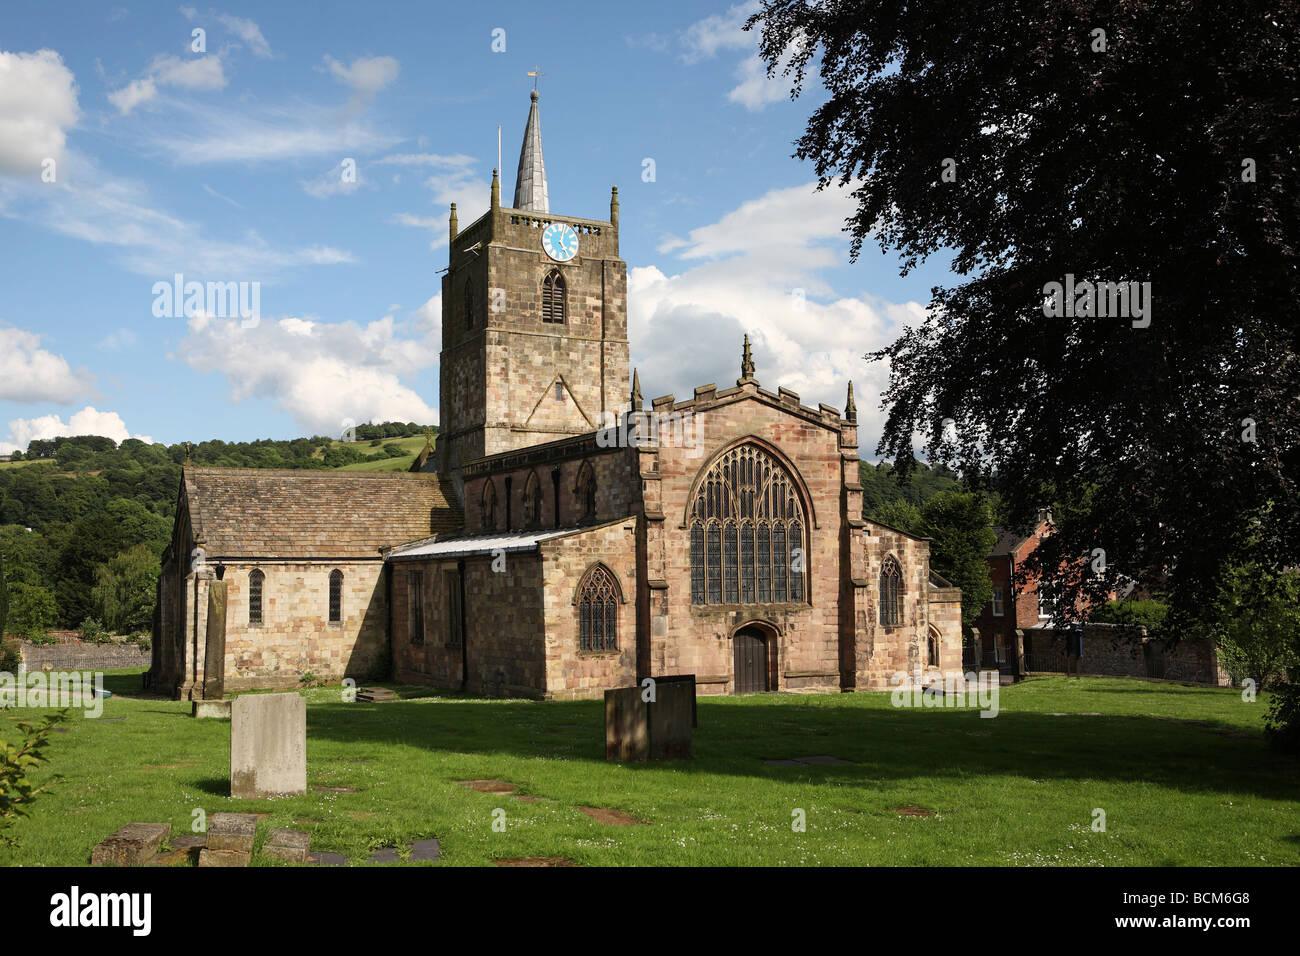 St Mary's Church, Wirksworth, Derbyshire, England, UK - Stock Image